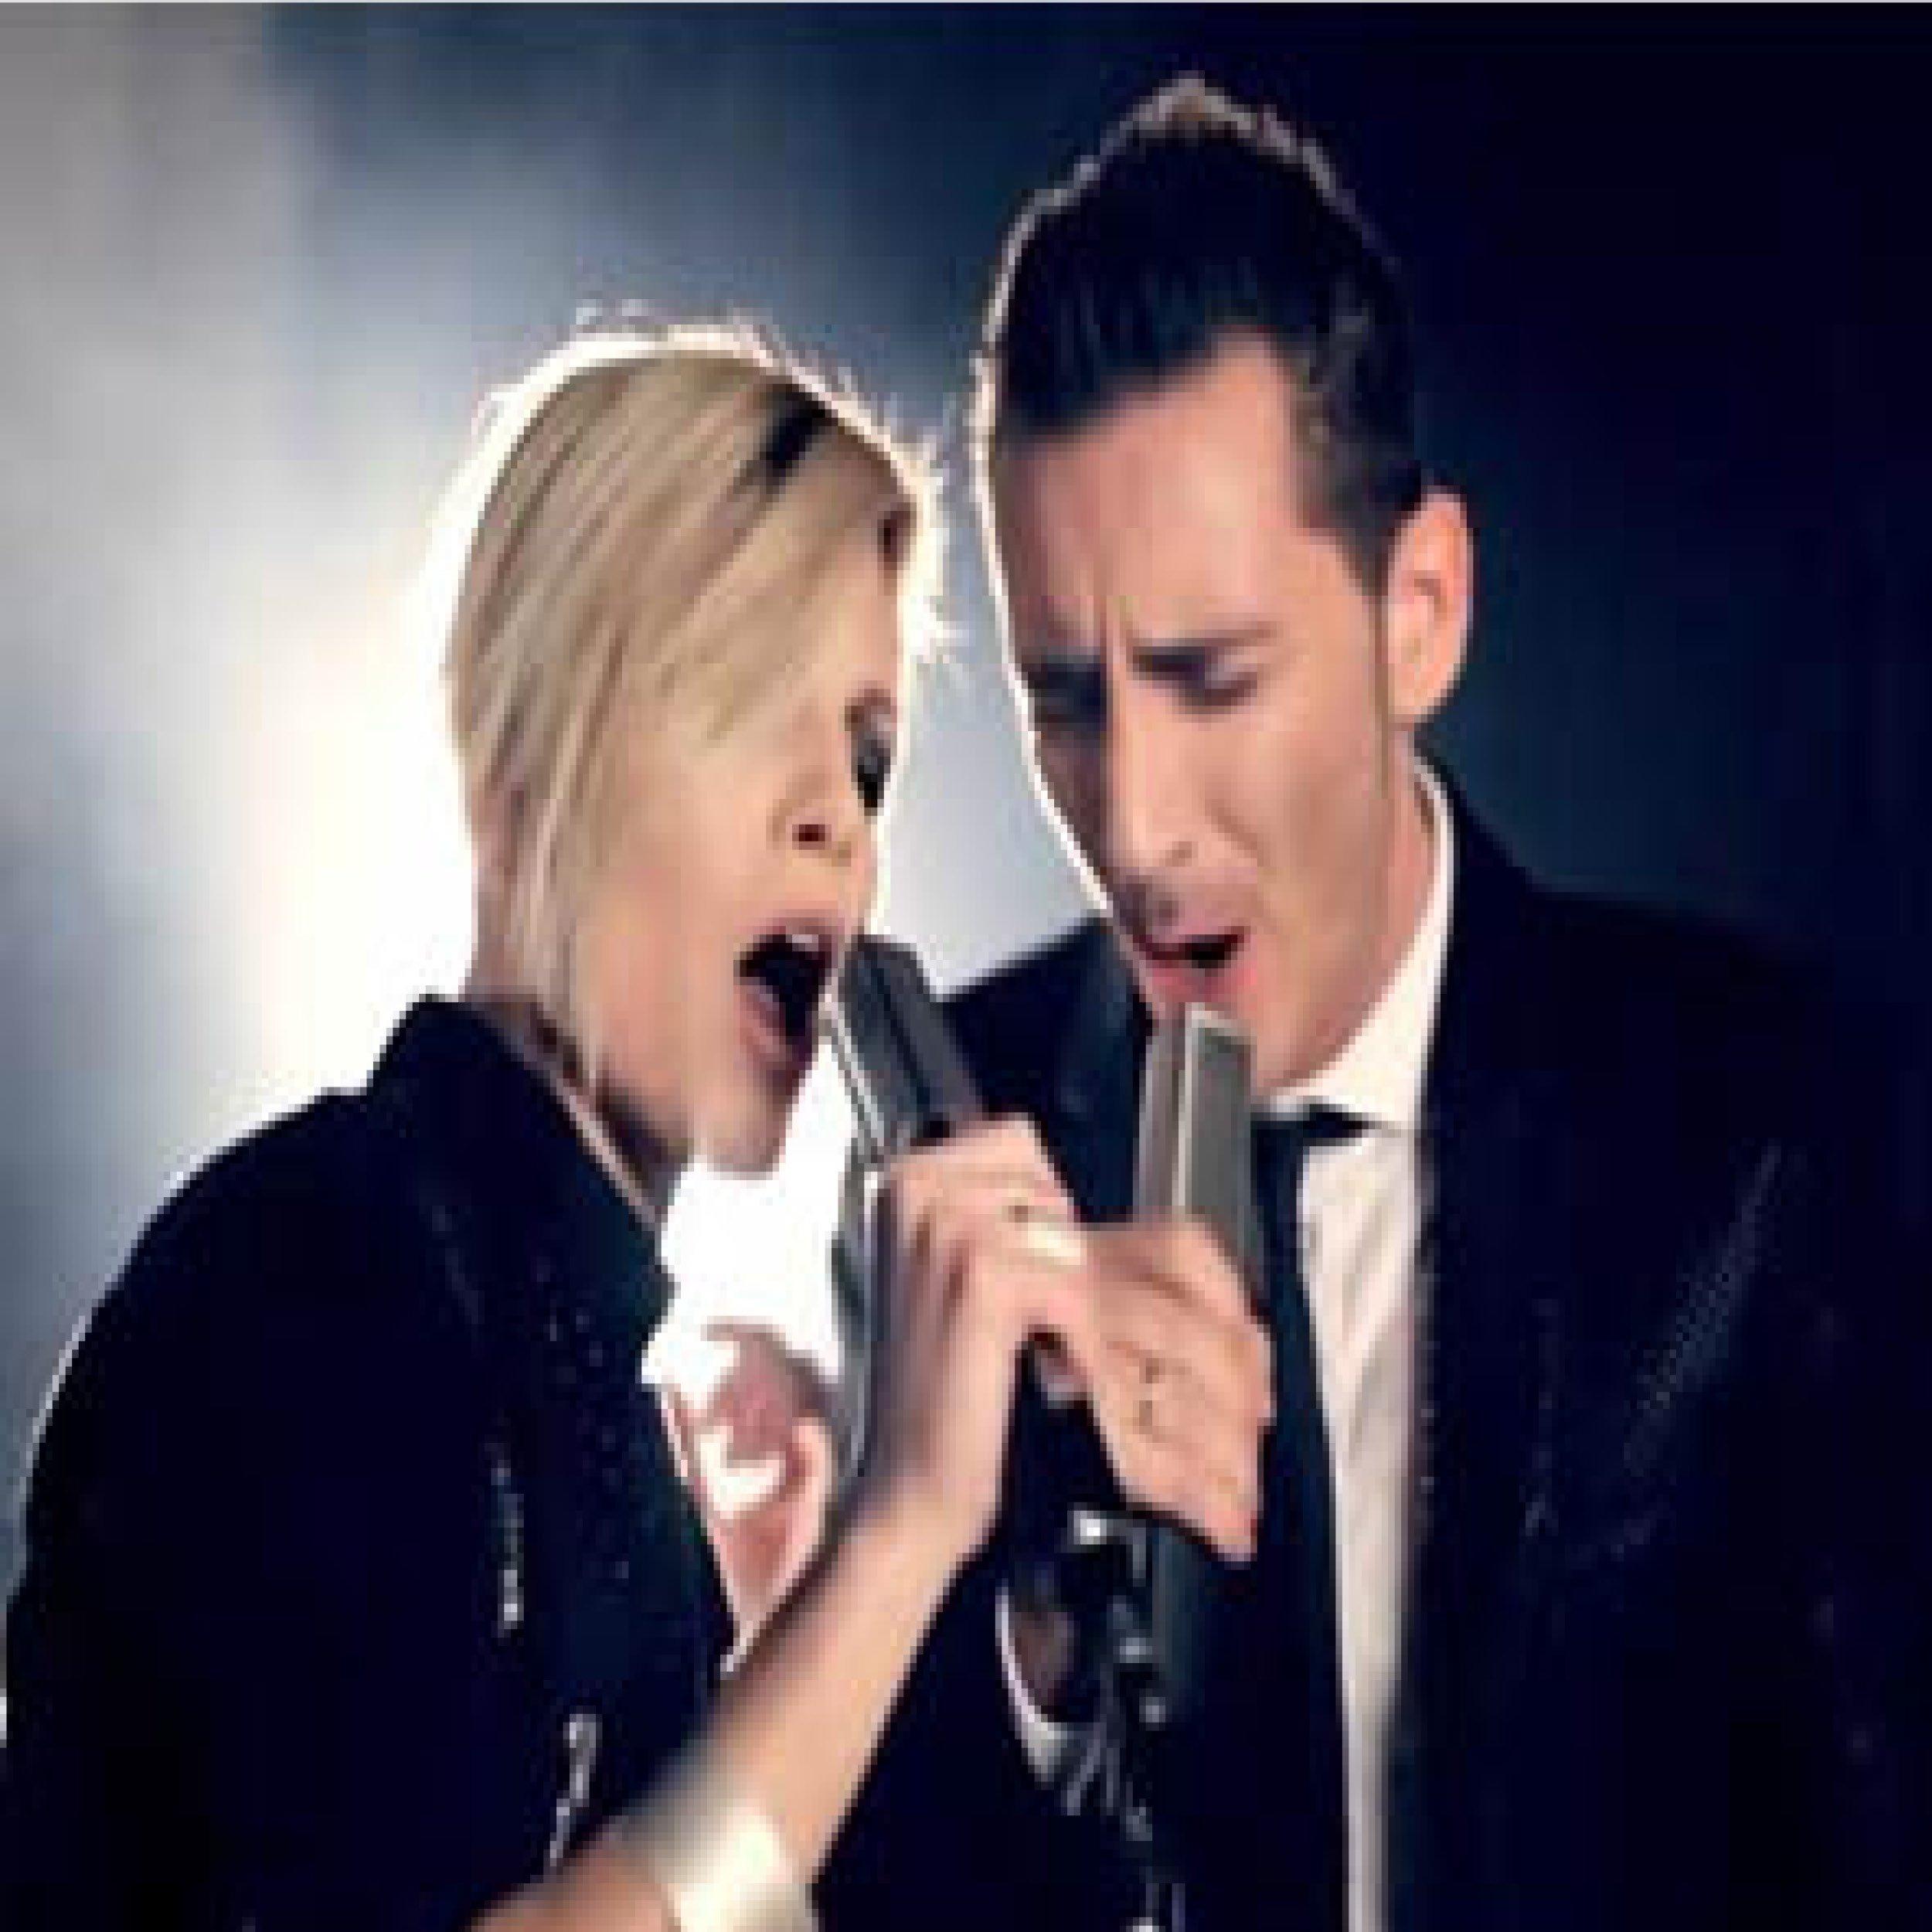 Italian Songs: Arriverà (Modà feat. Emma)